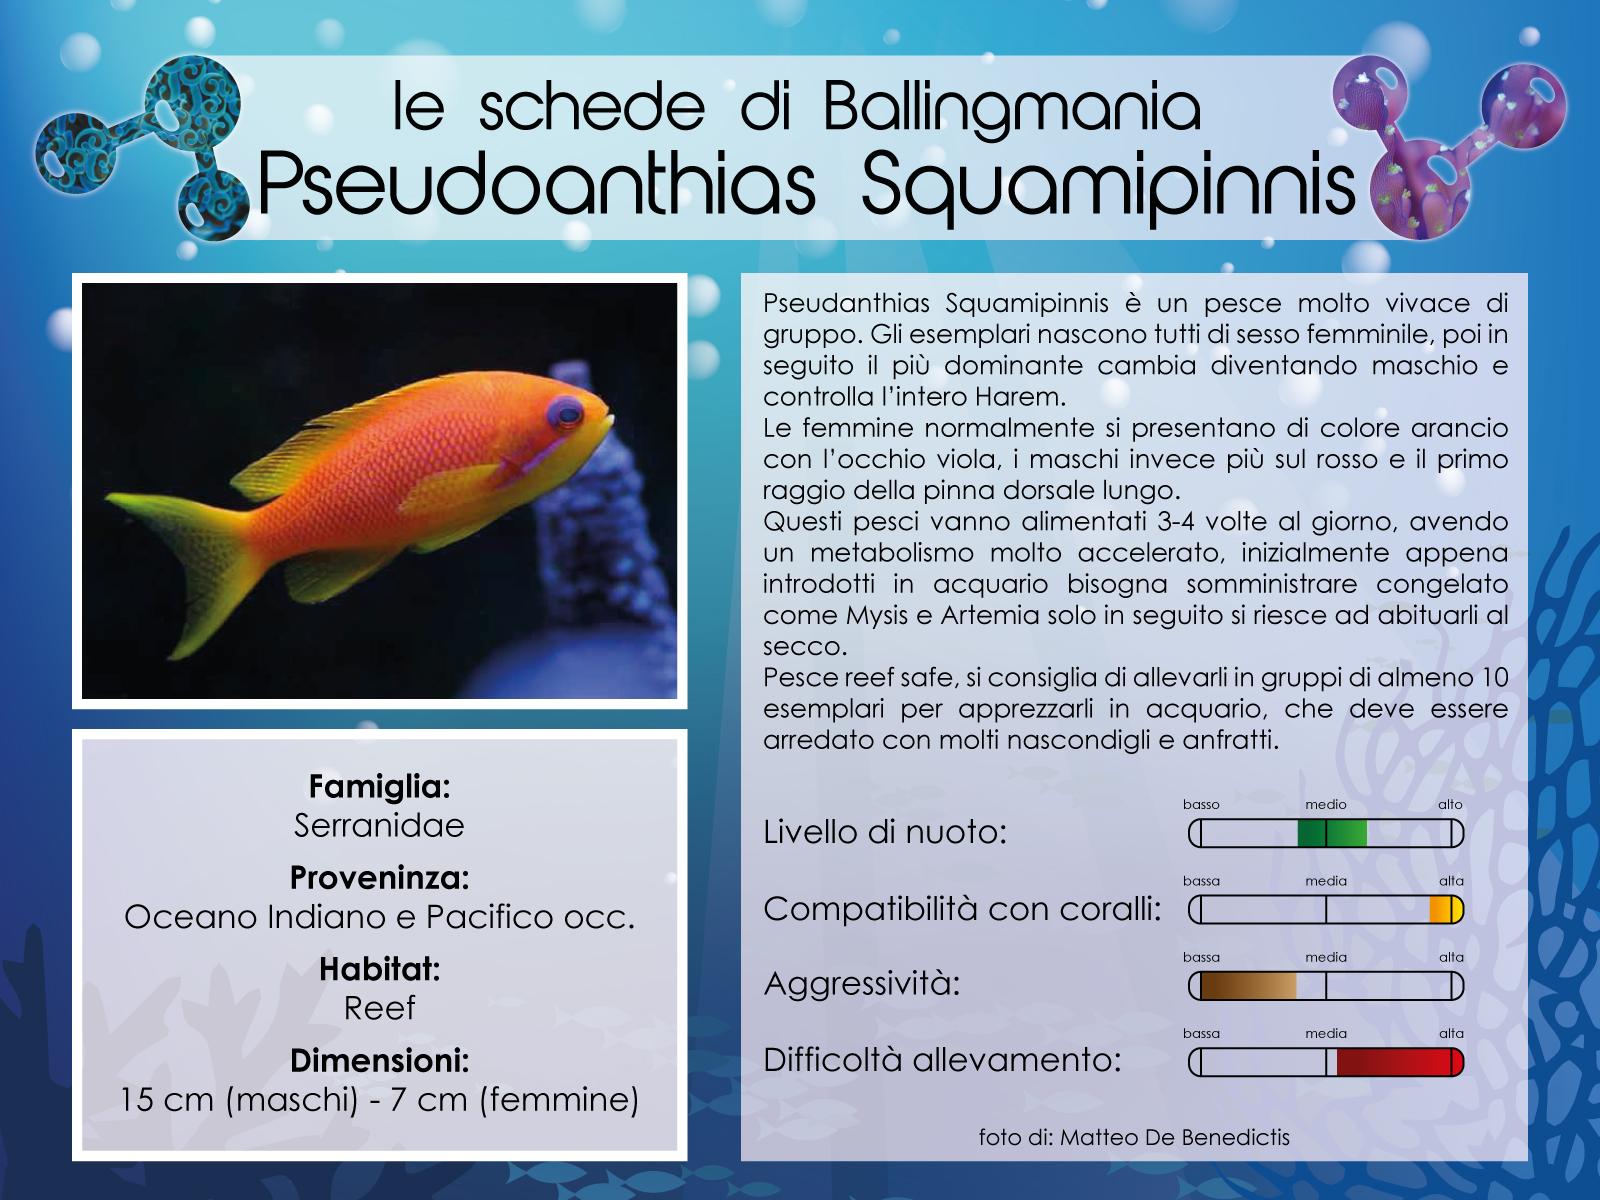 Pseudoanthias Squamipinnis